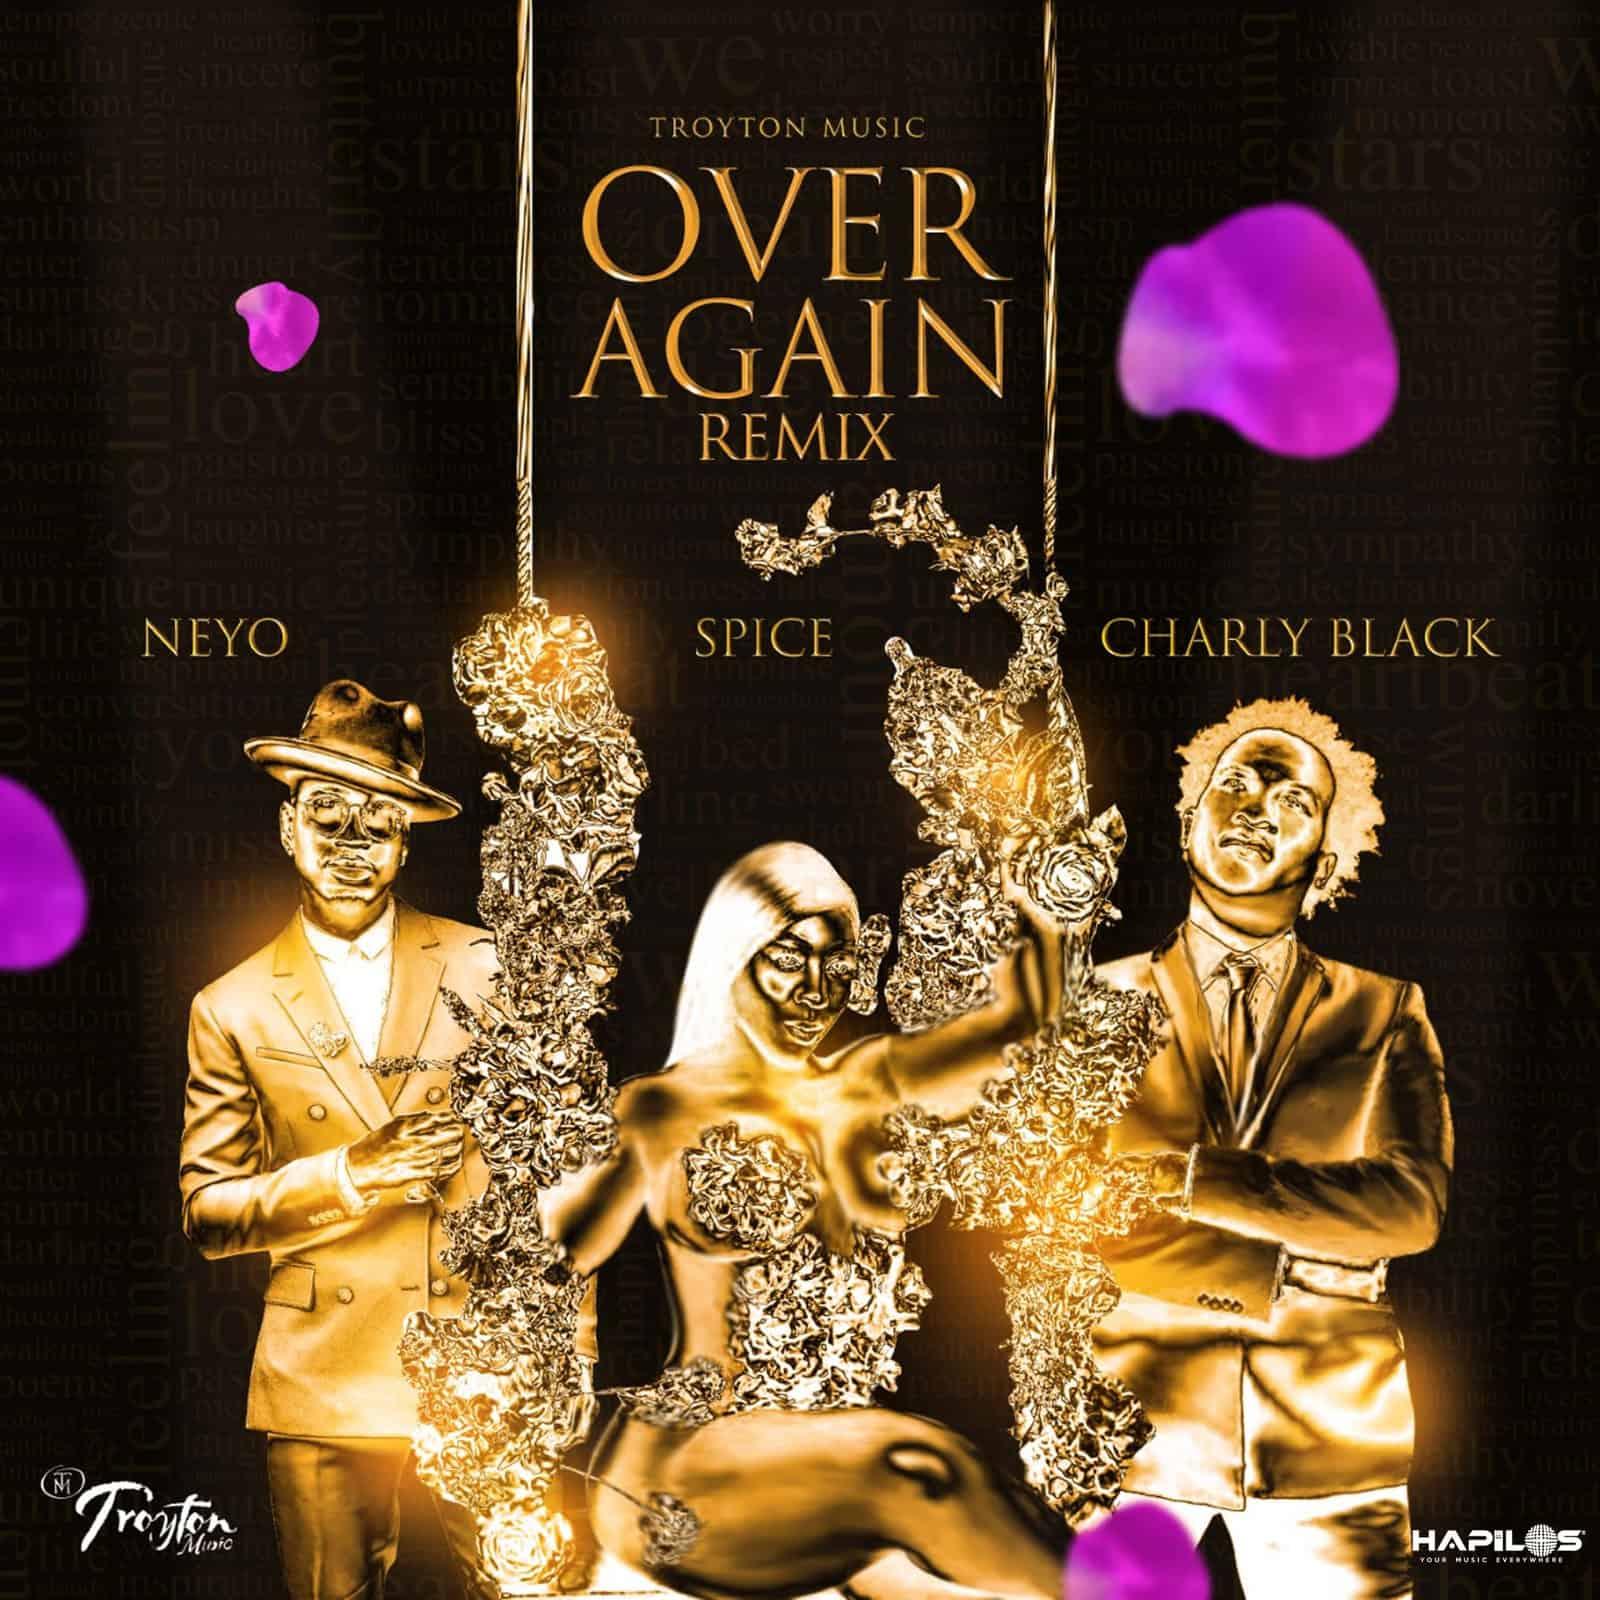 Charly Black, Ne-Yo & Spice - Over Again (Remix)